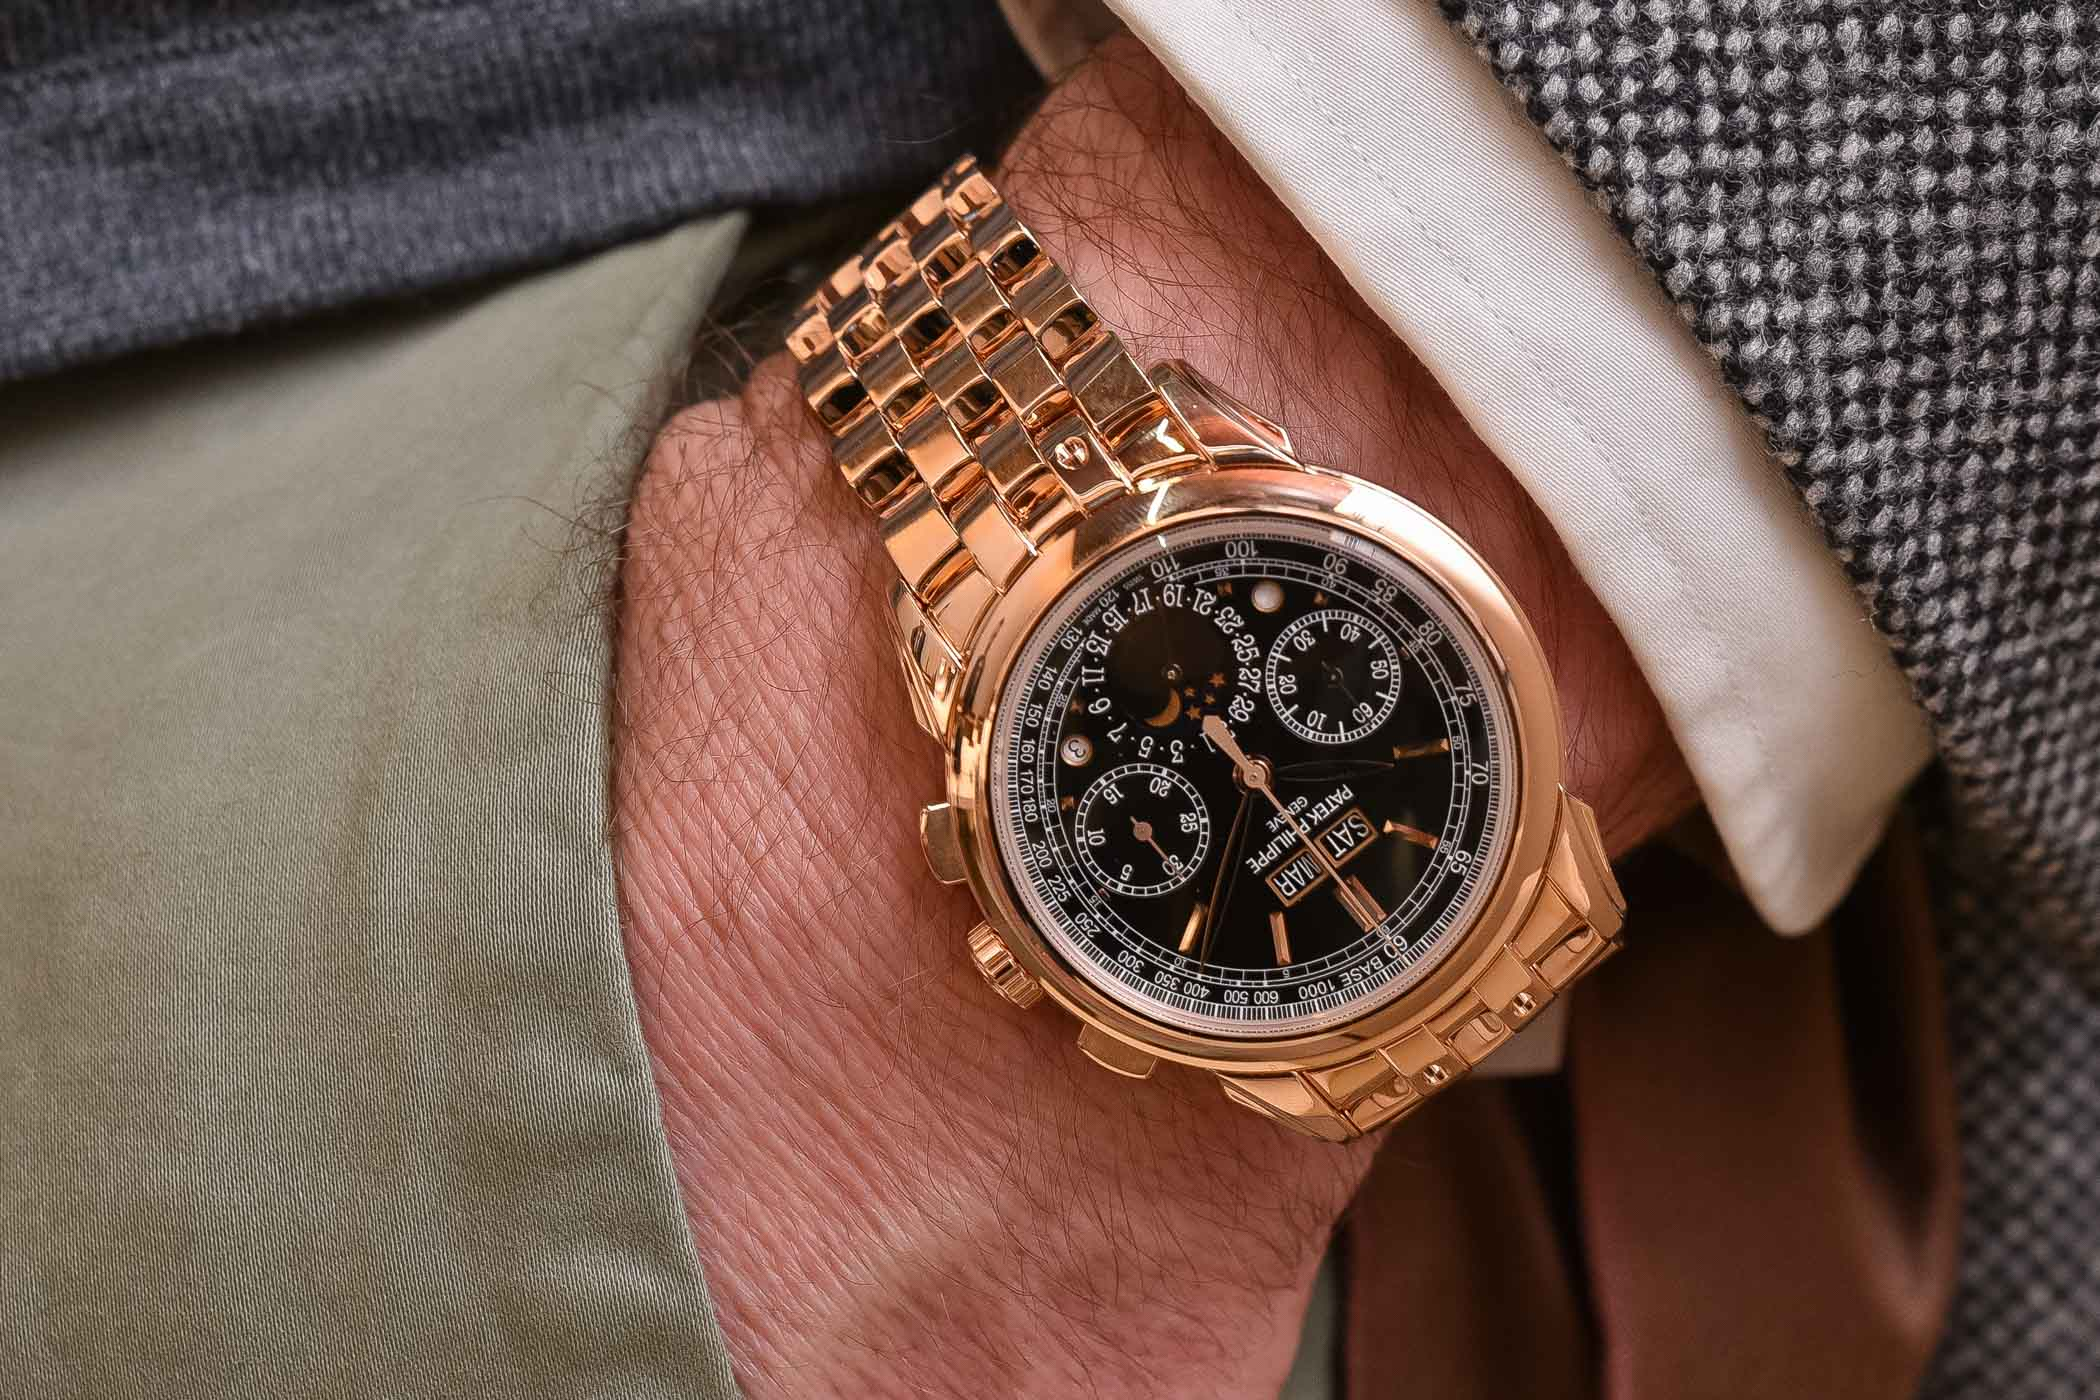 Patek Philippe Perpetual Calendar Chronograph 5270r Gold bracelet